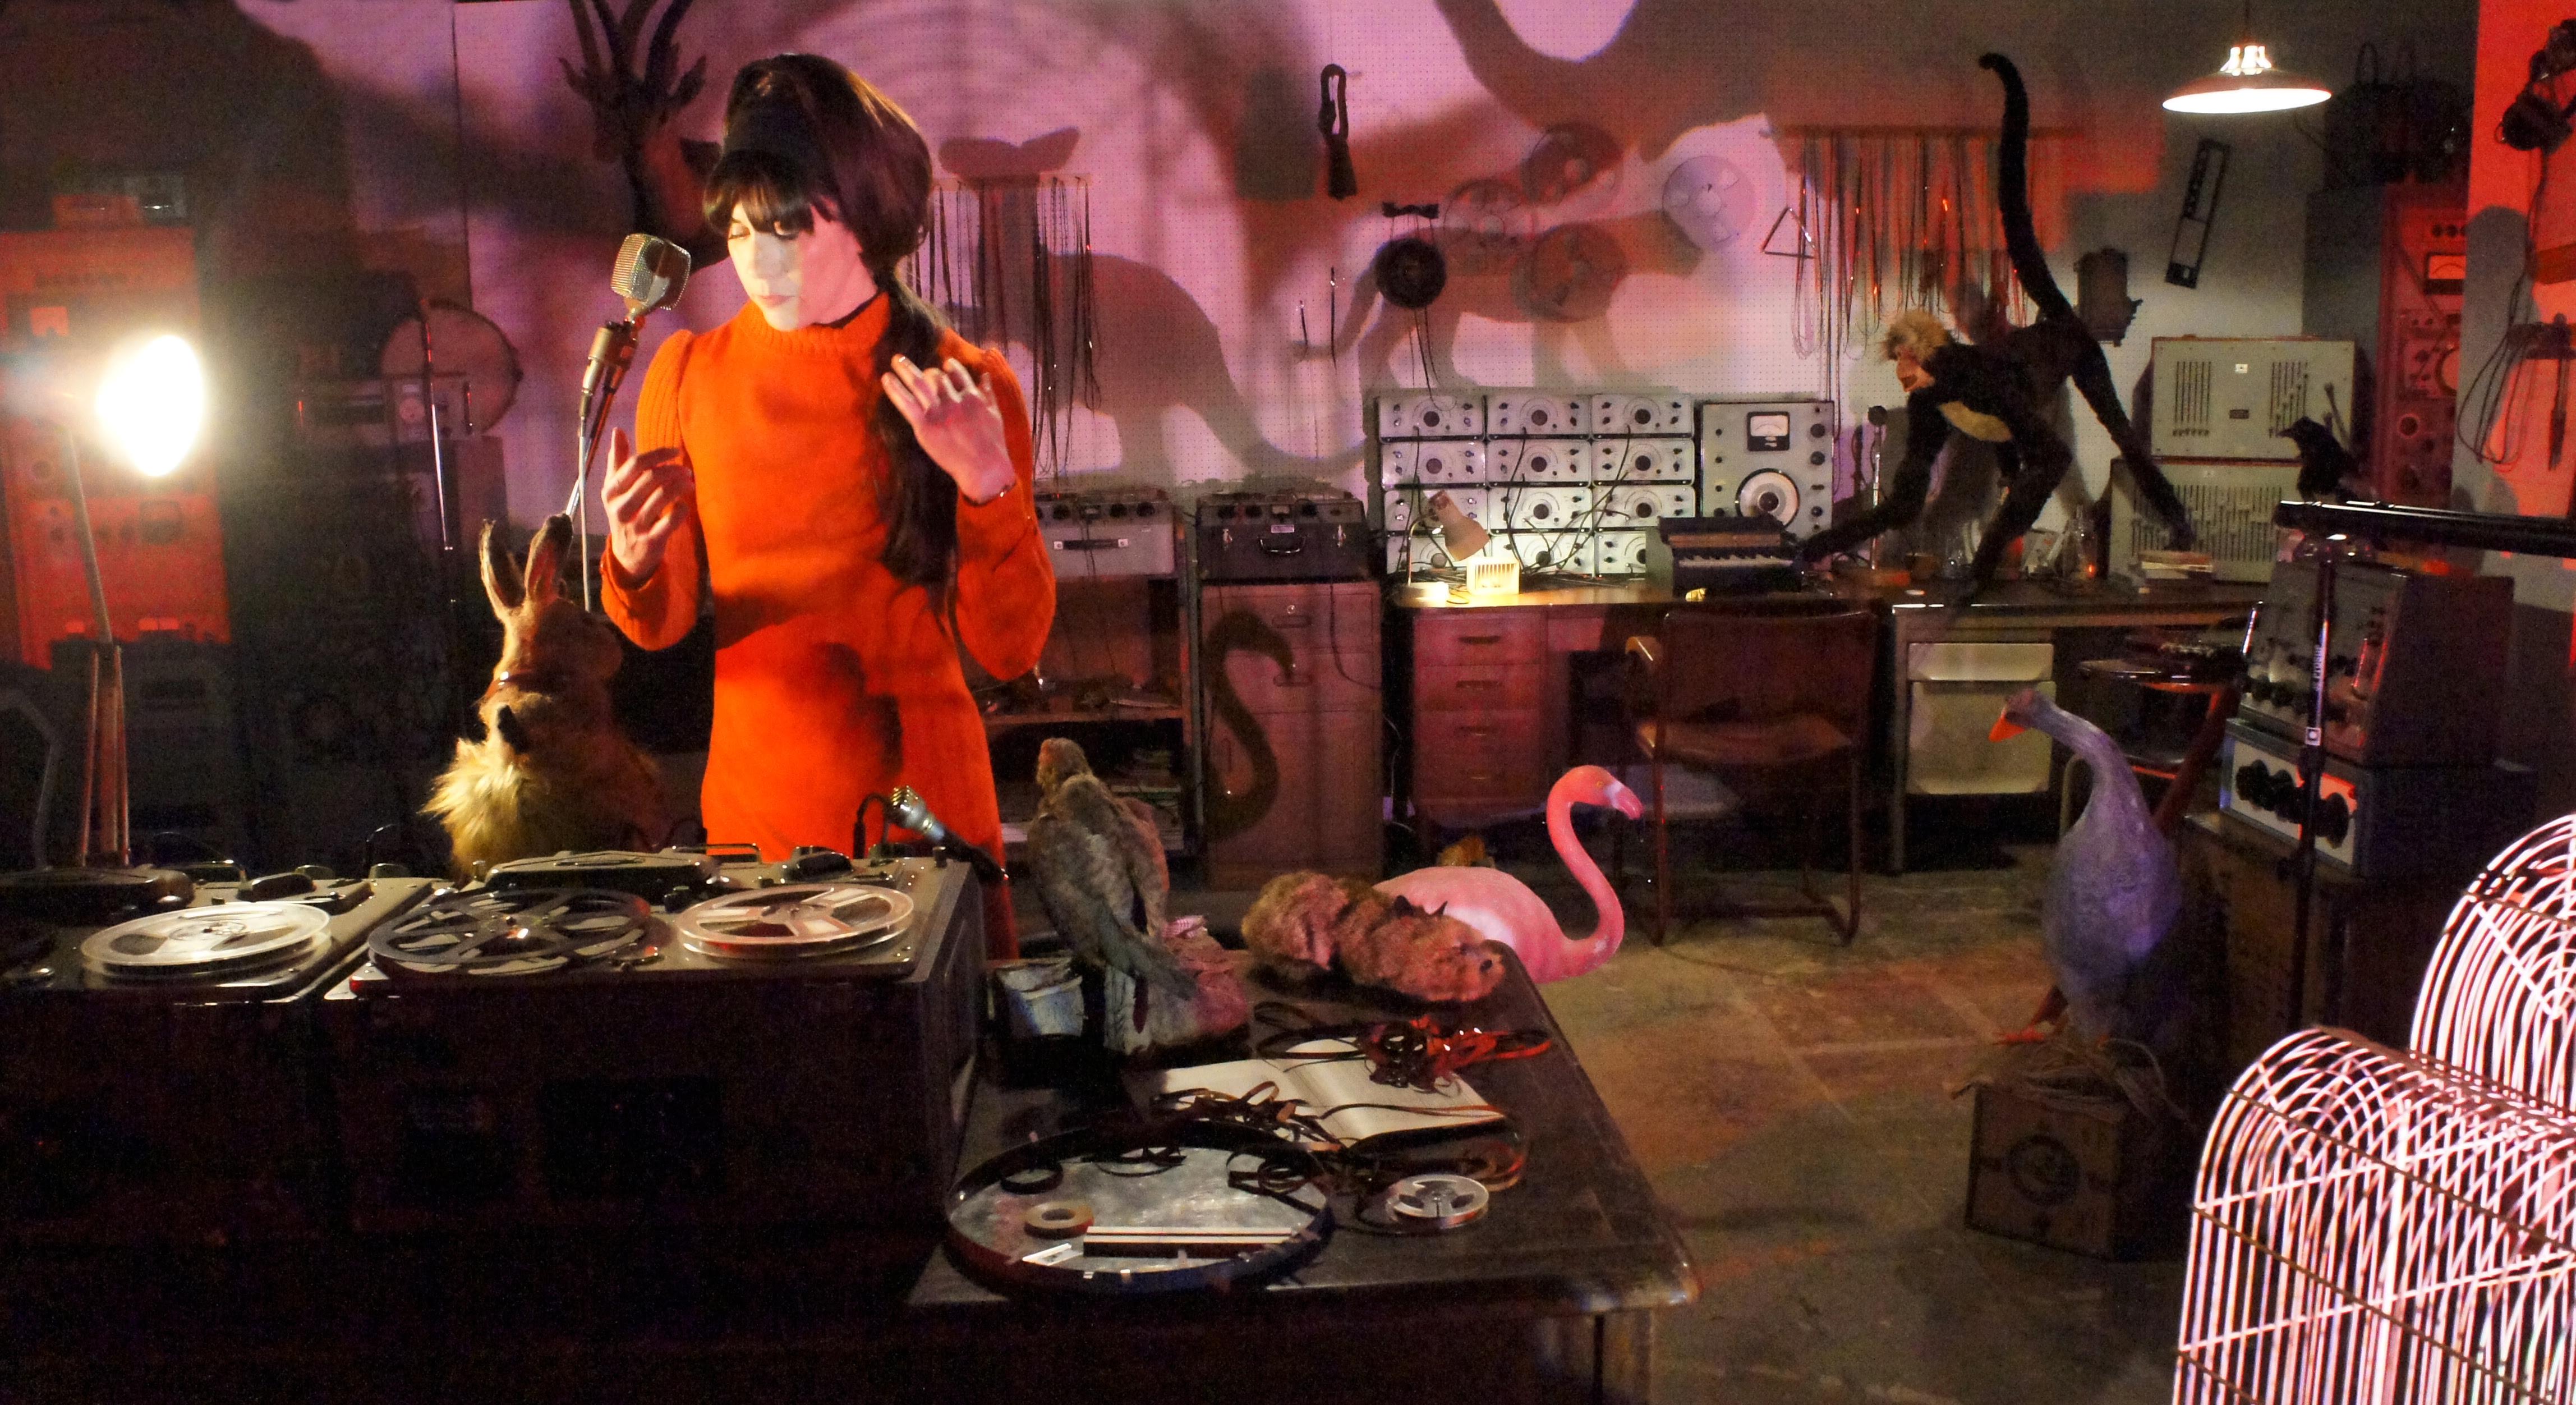 NEWS! New Delia Derbyshire film by Caroline Catz with Cosey Fanni Tutti